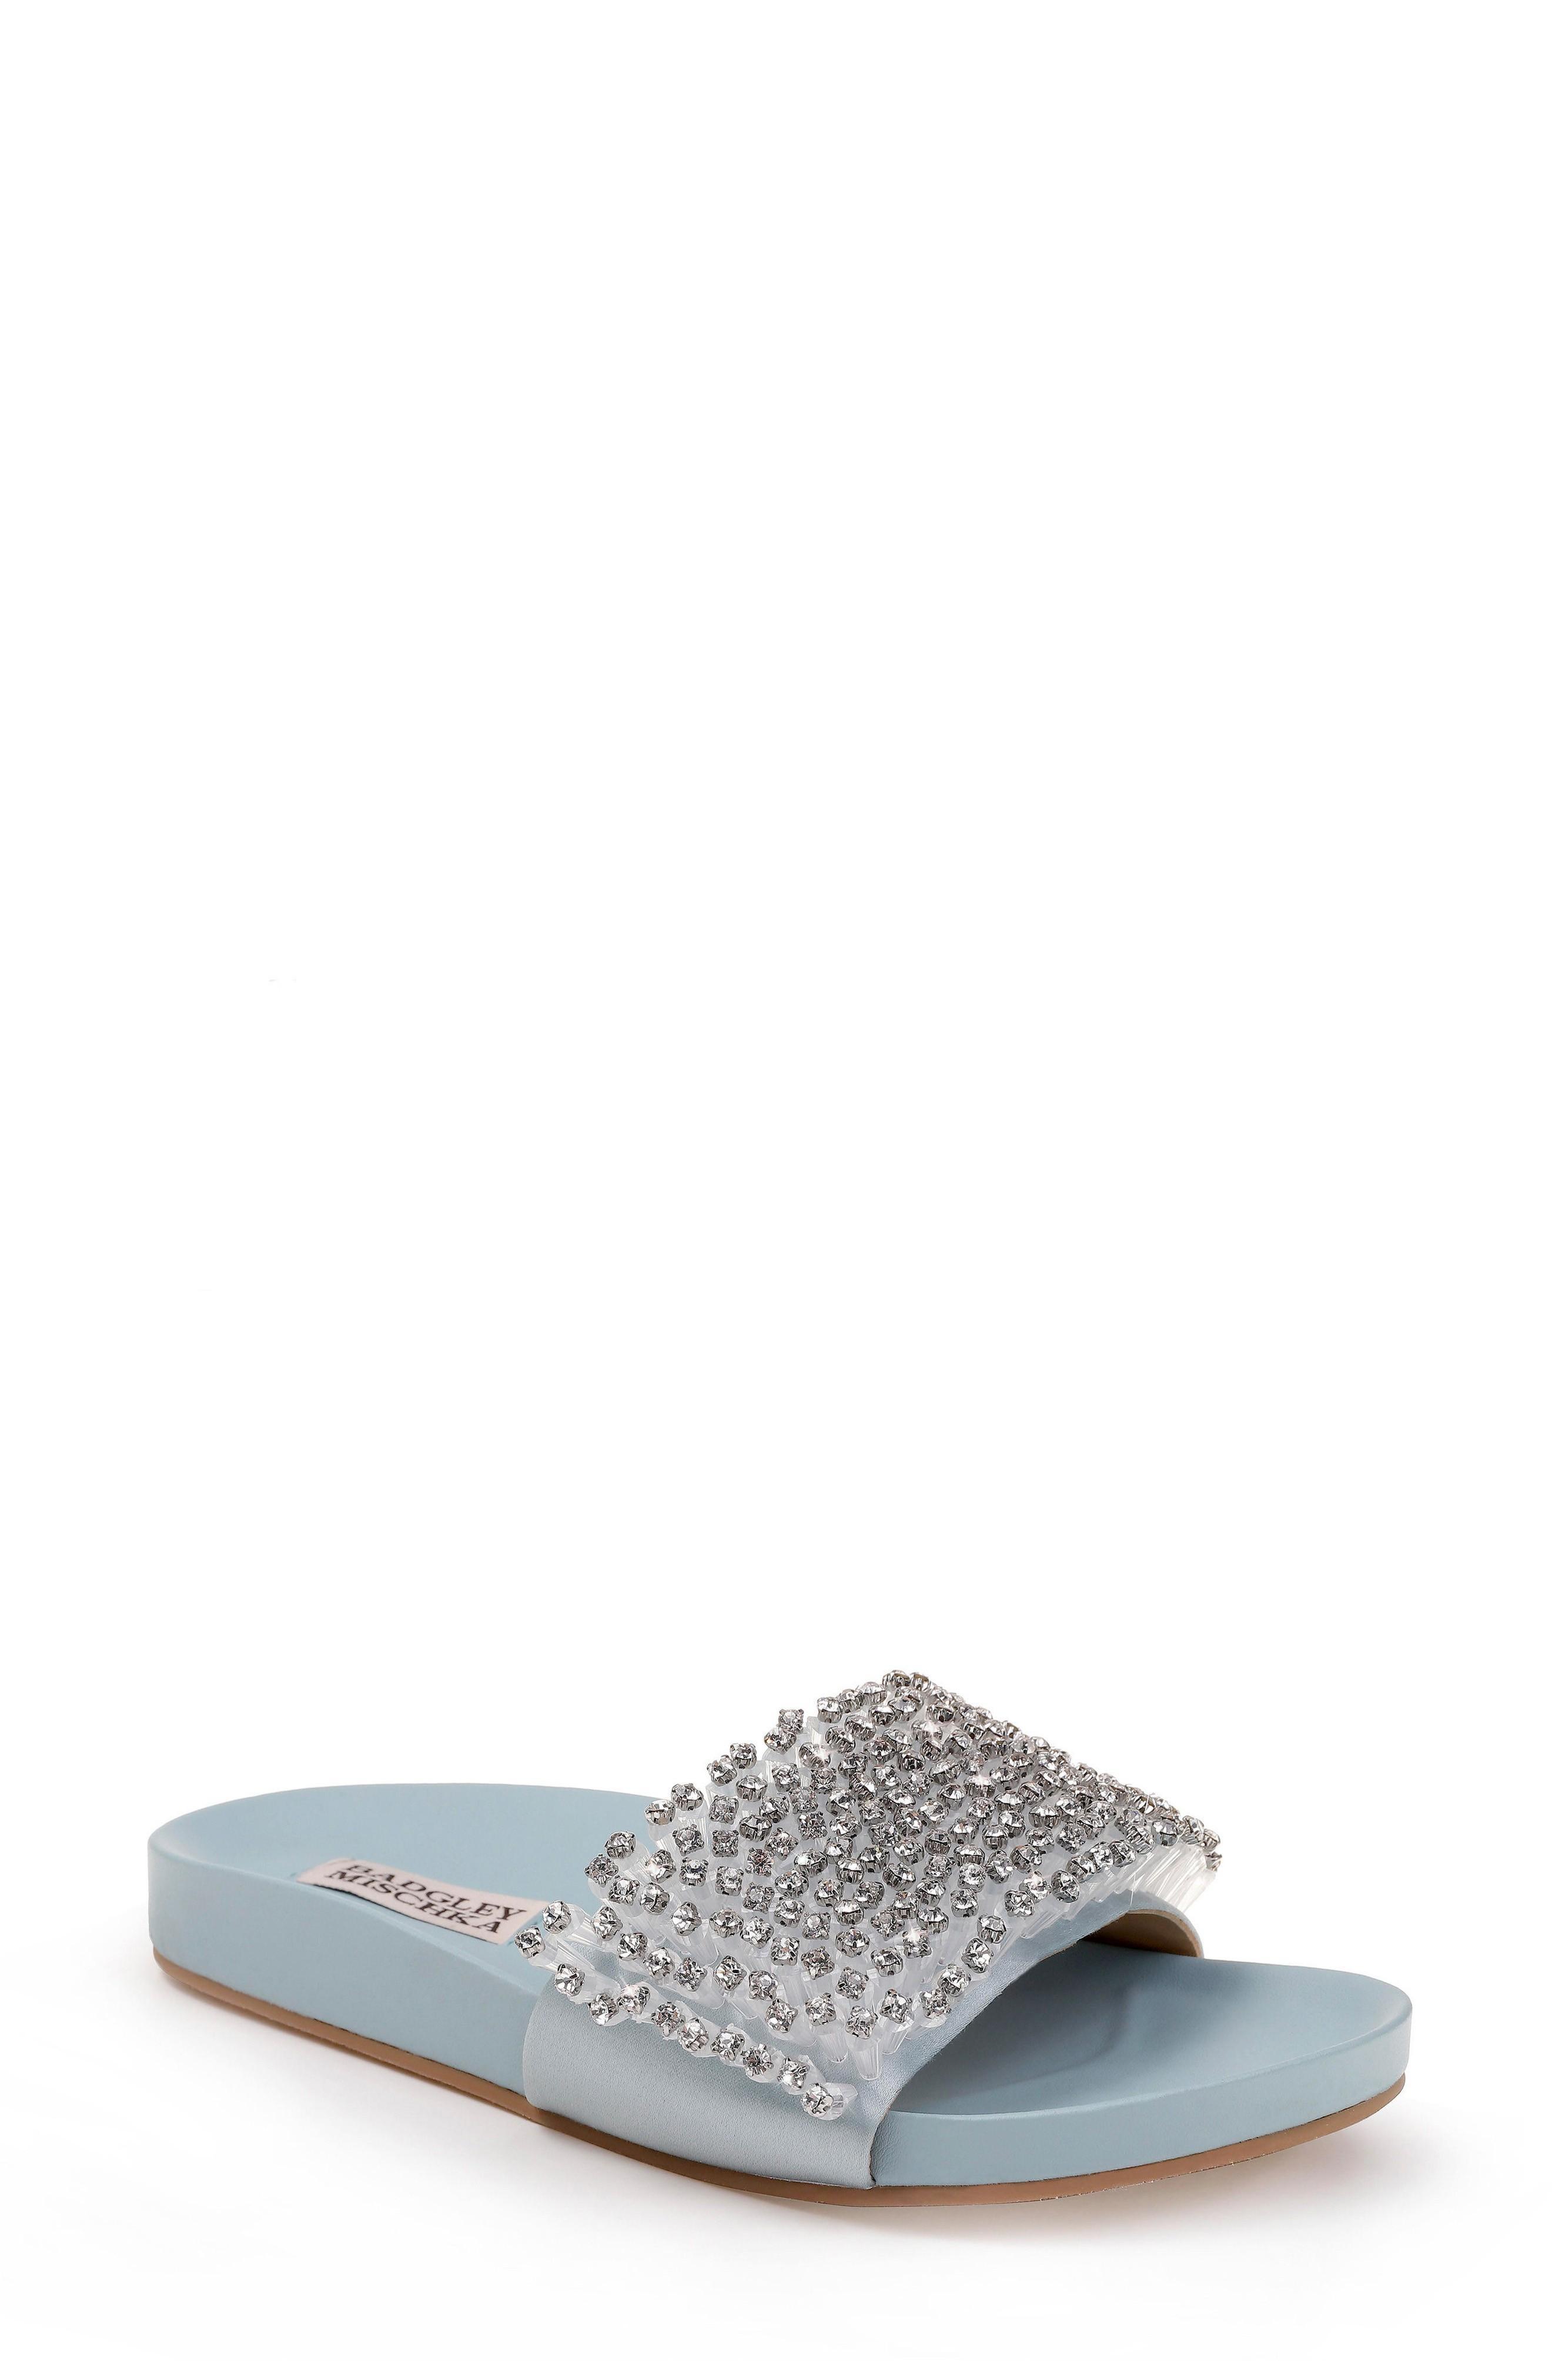 5df193594 A sporty slide sandal gets a glamorous update with sparkling 3D crystals.  Style Name  Badgley Mischka Horton Crystal Embellished Sandal (Women).